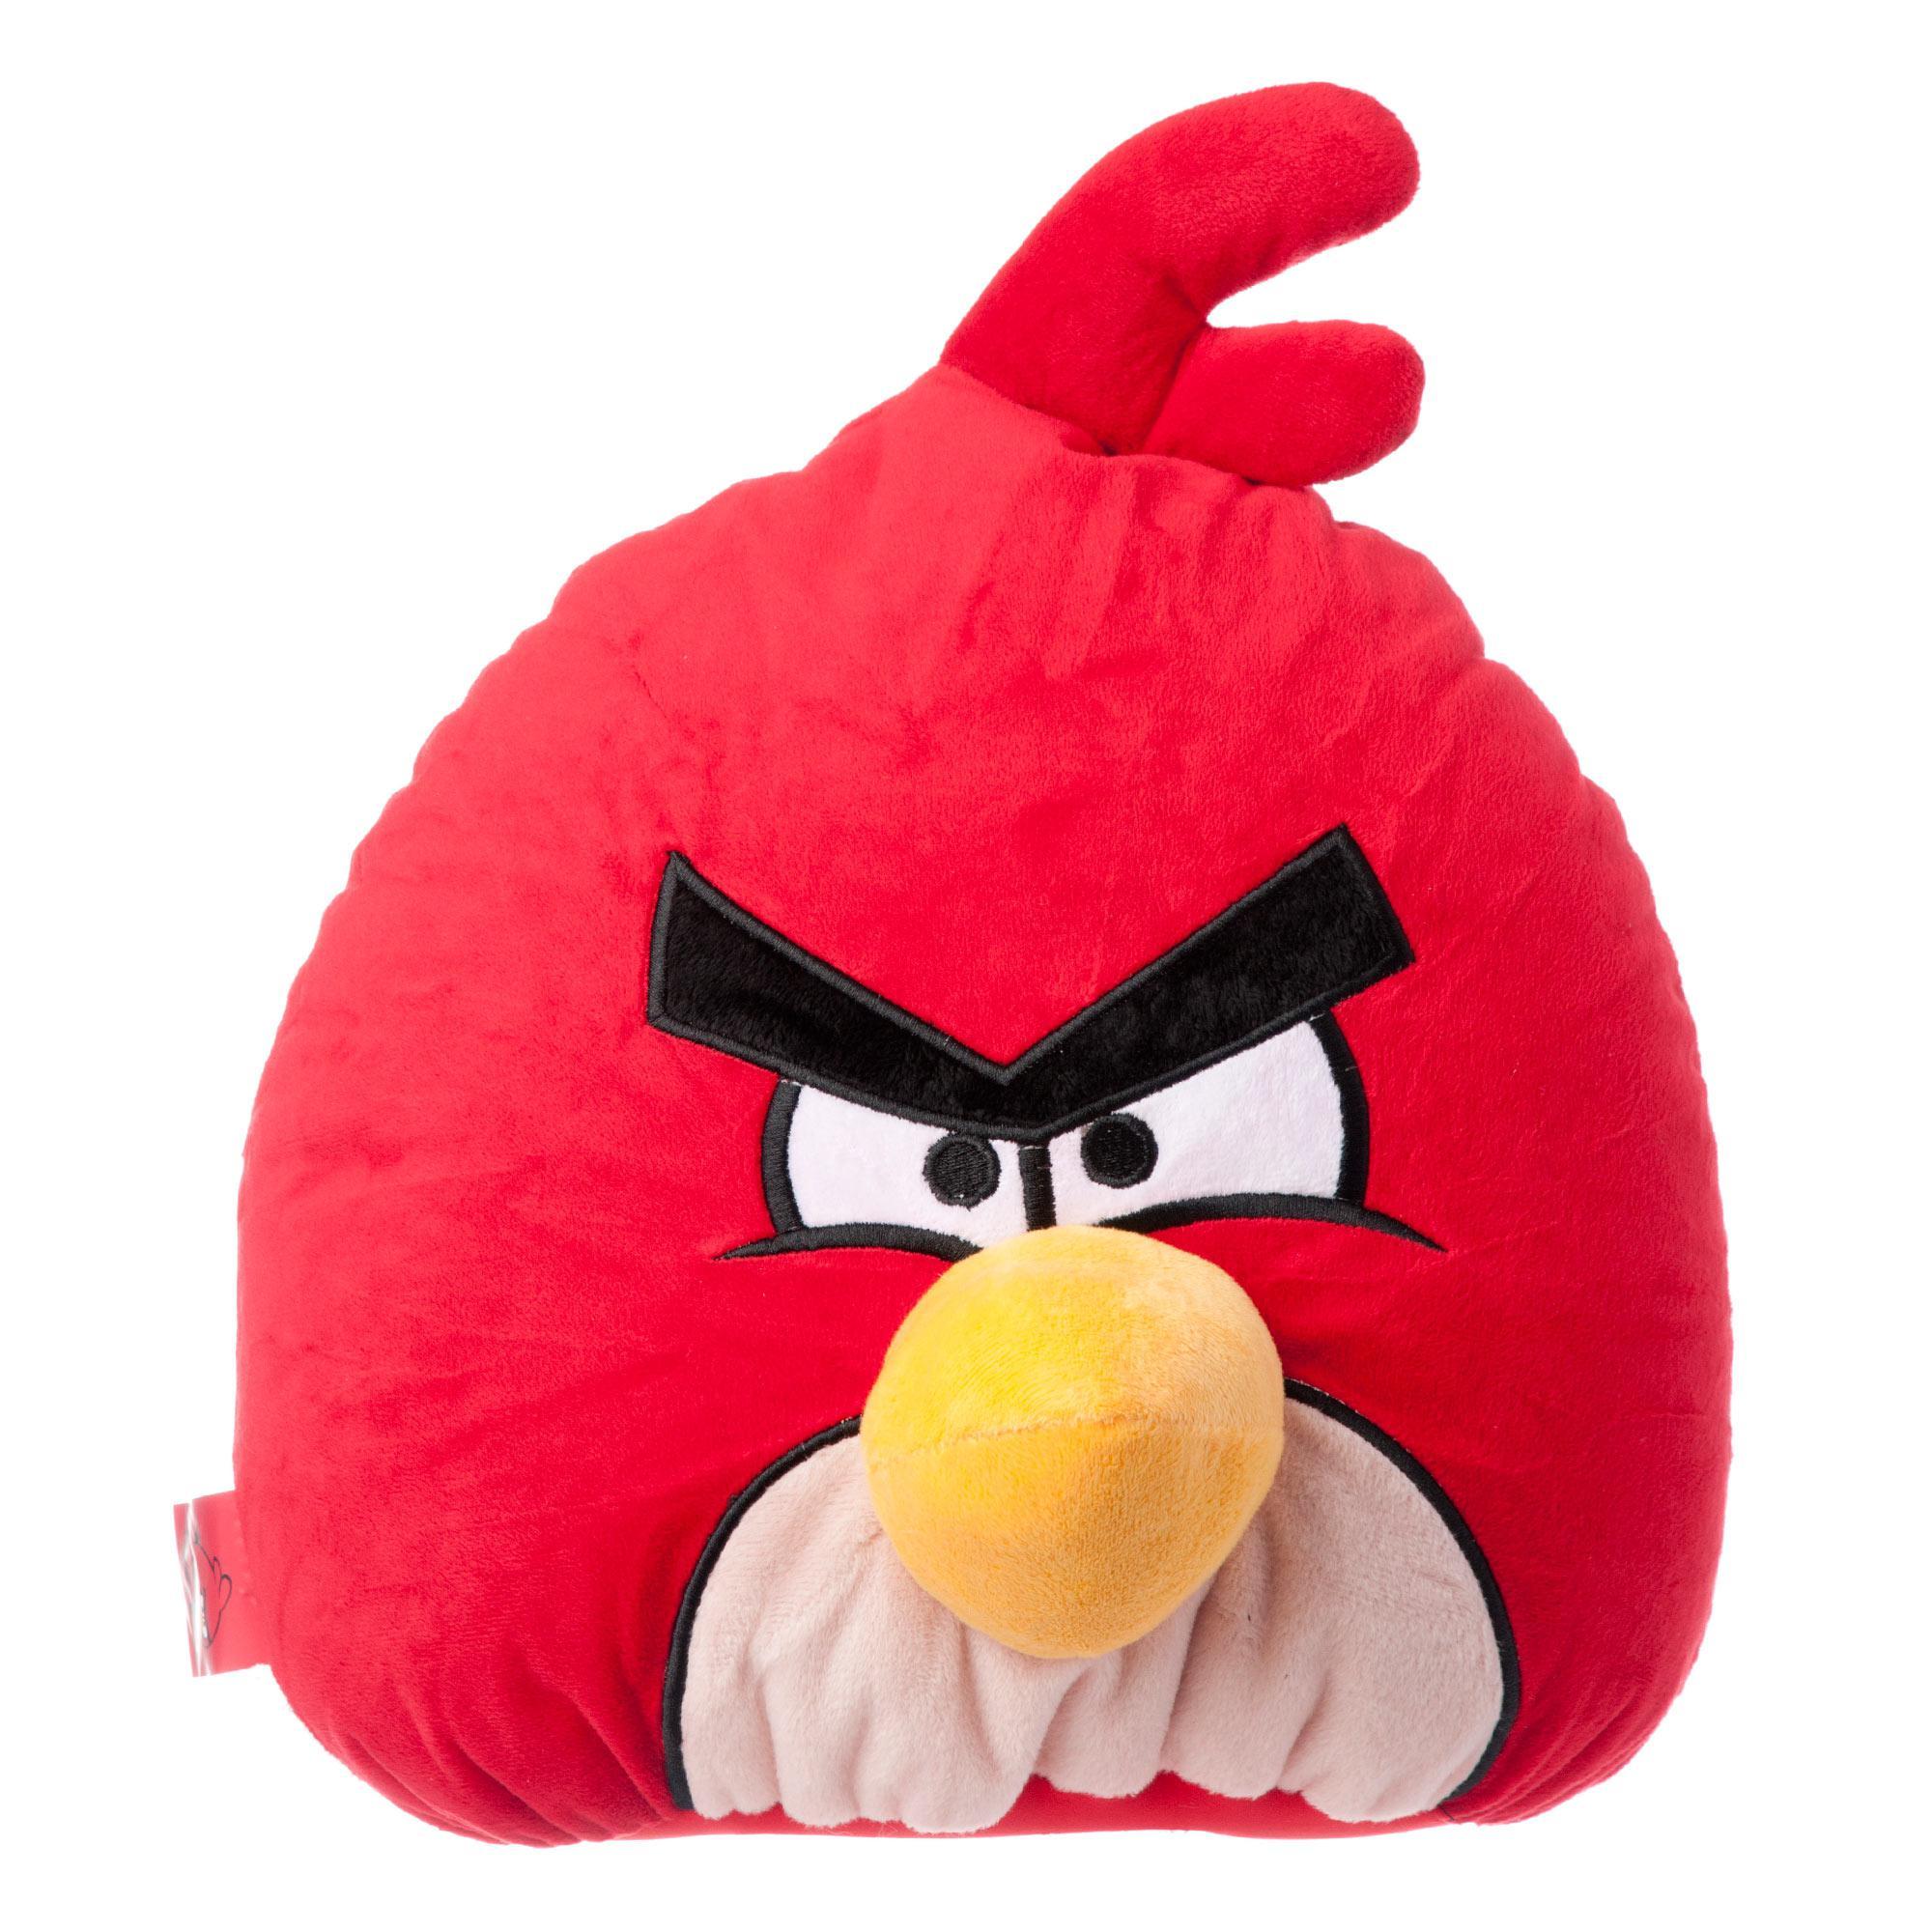 Декоративная подушка Angry Birds - Красная птица, 30 см